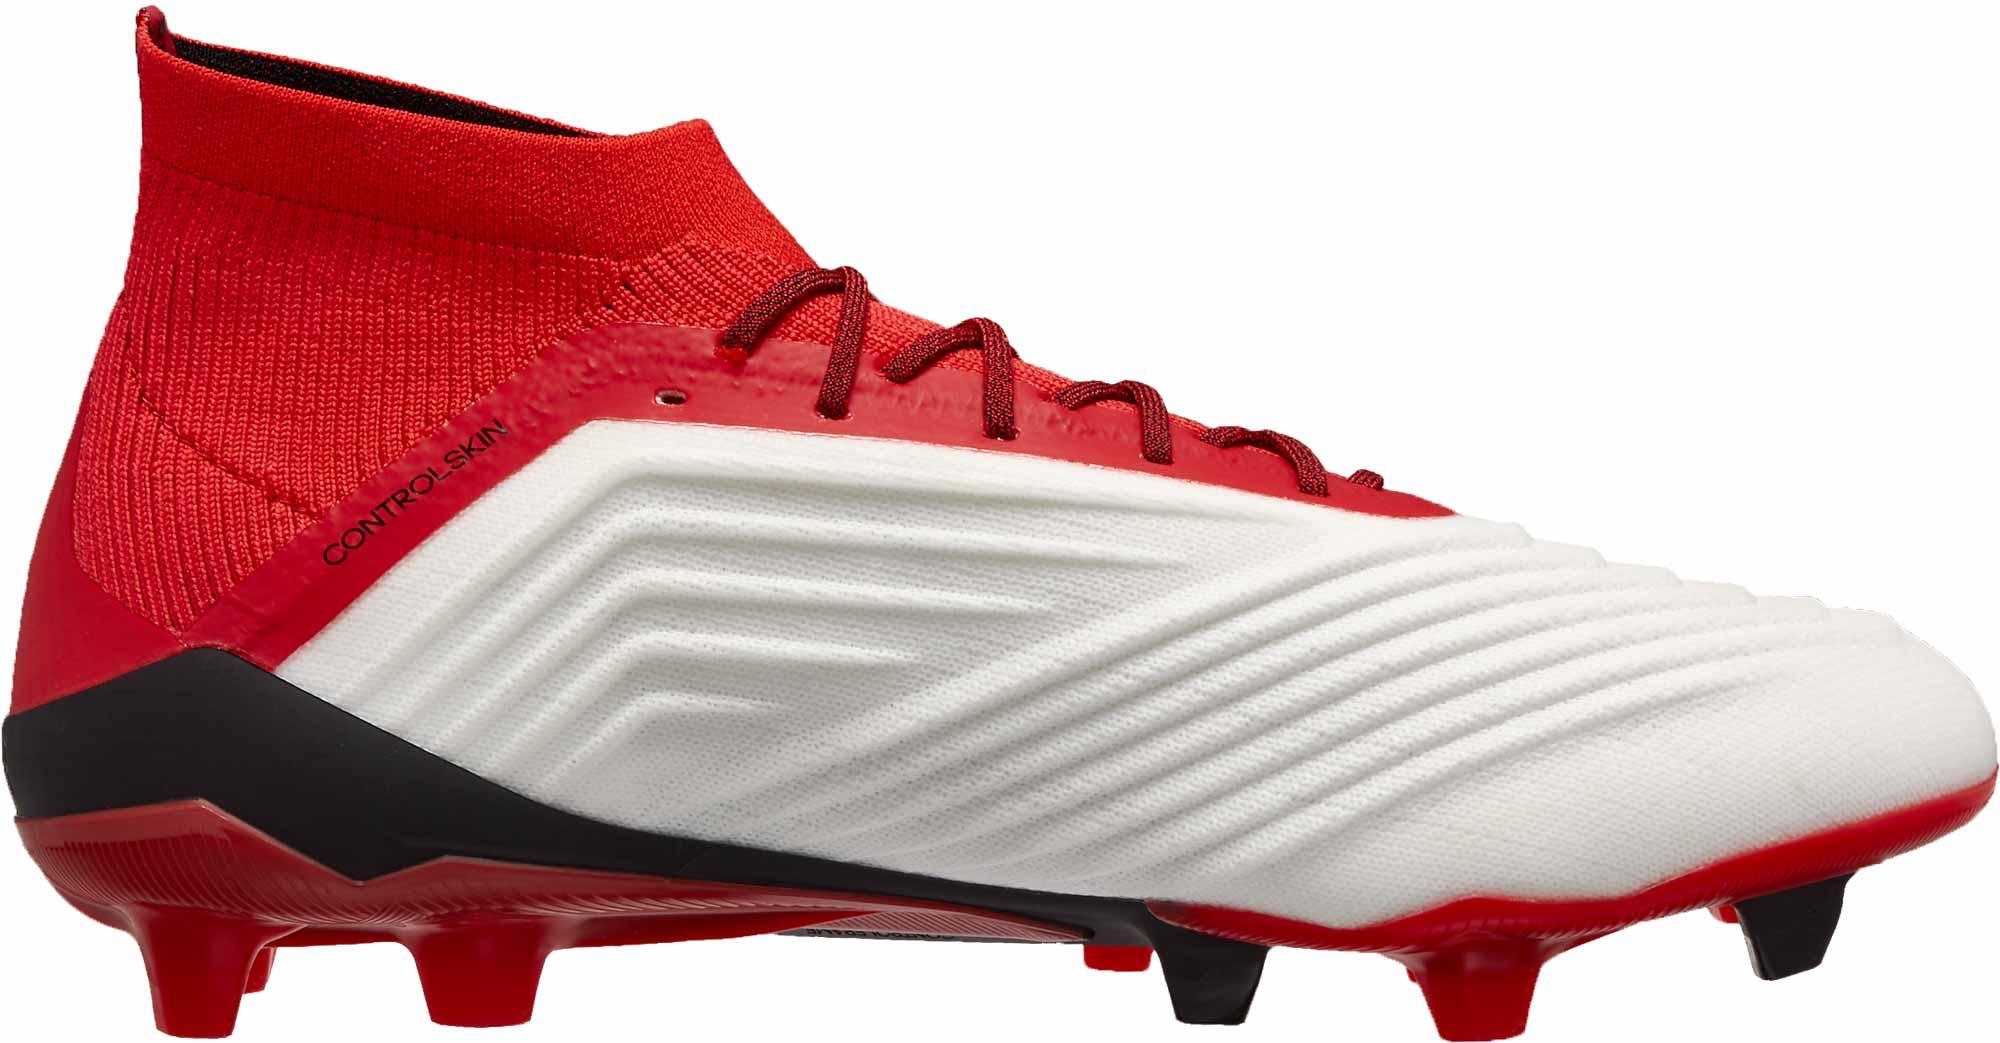 50c27a11ac1 adidas Predator 18.1 FG - White   Real Coral - Soccer Master